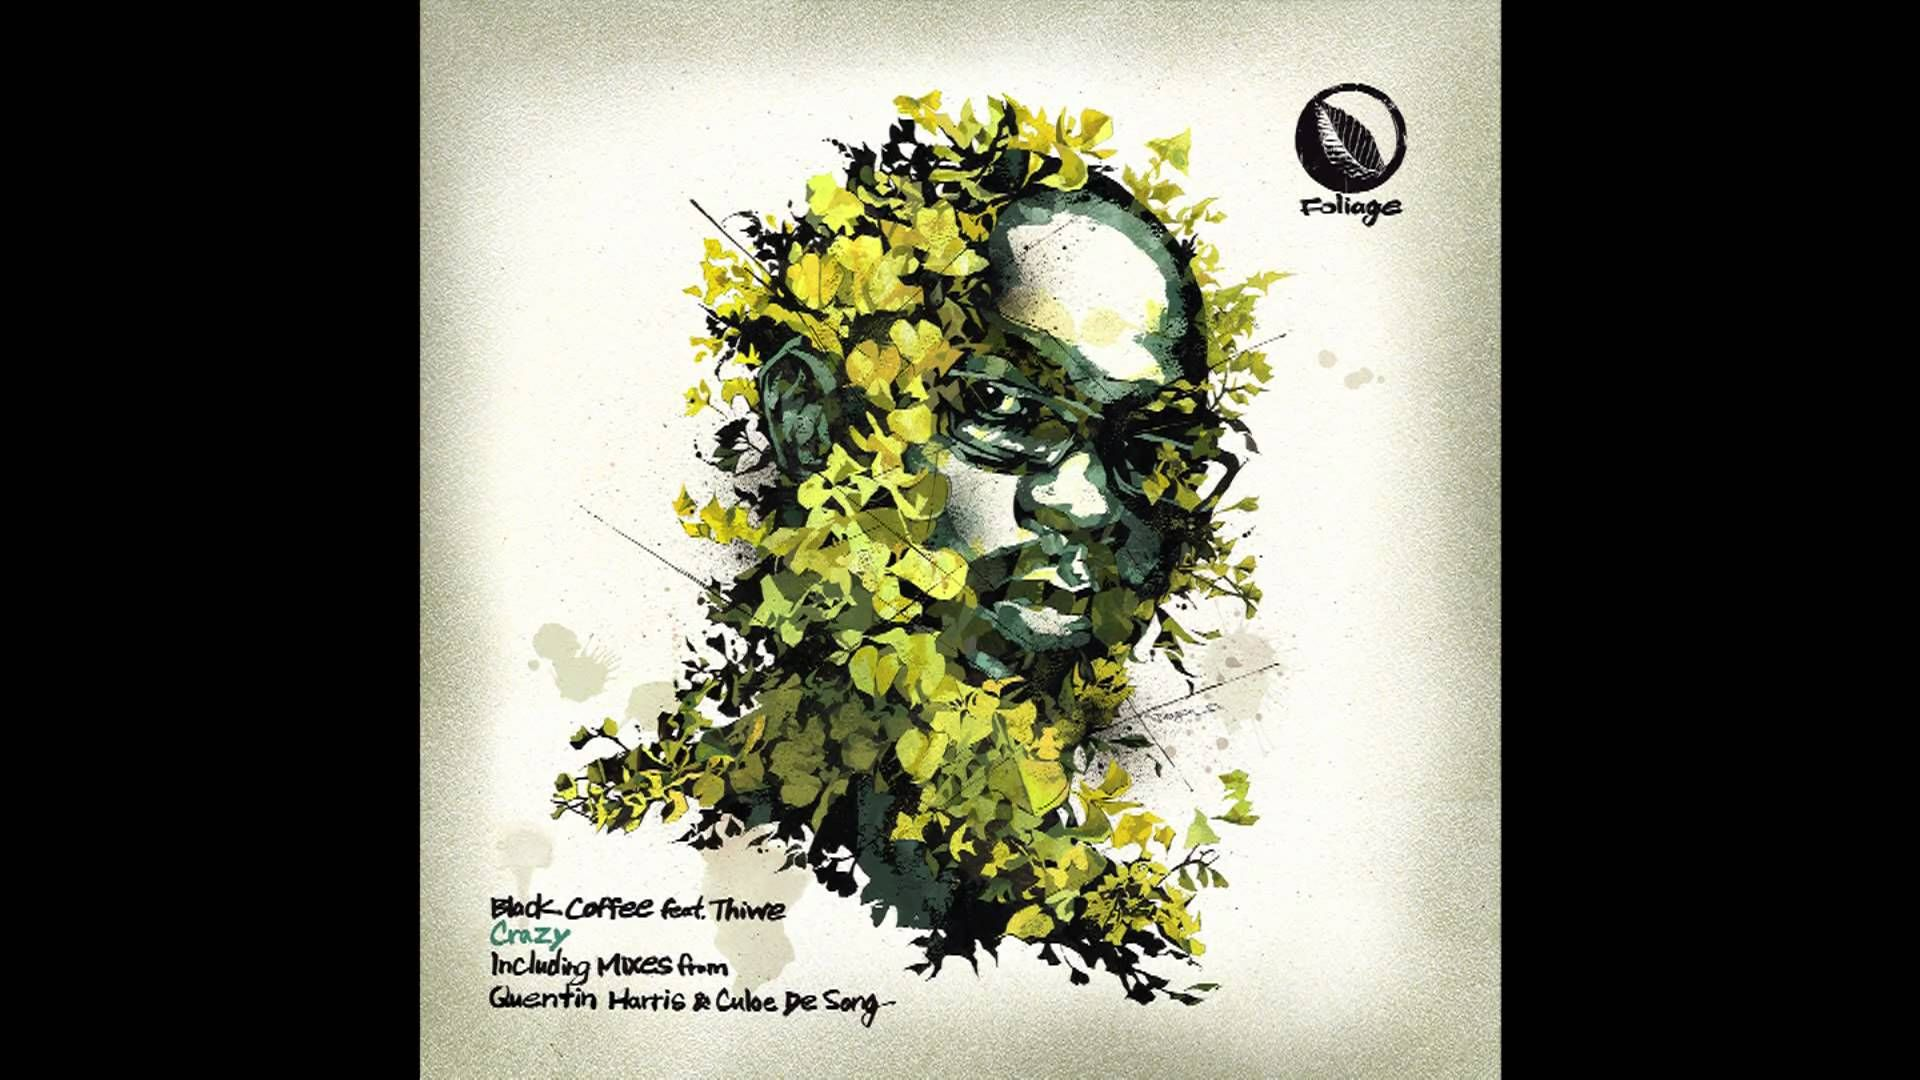 Black Coffee feat. Thiwe Crazy (Quentin Harris Remix